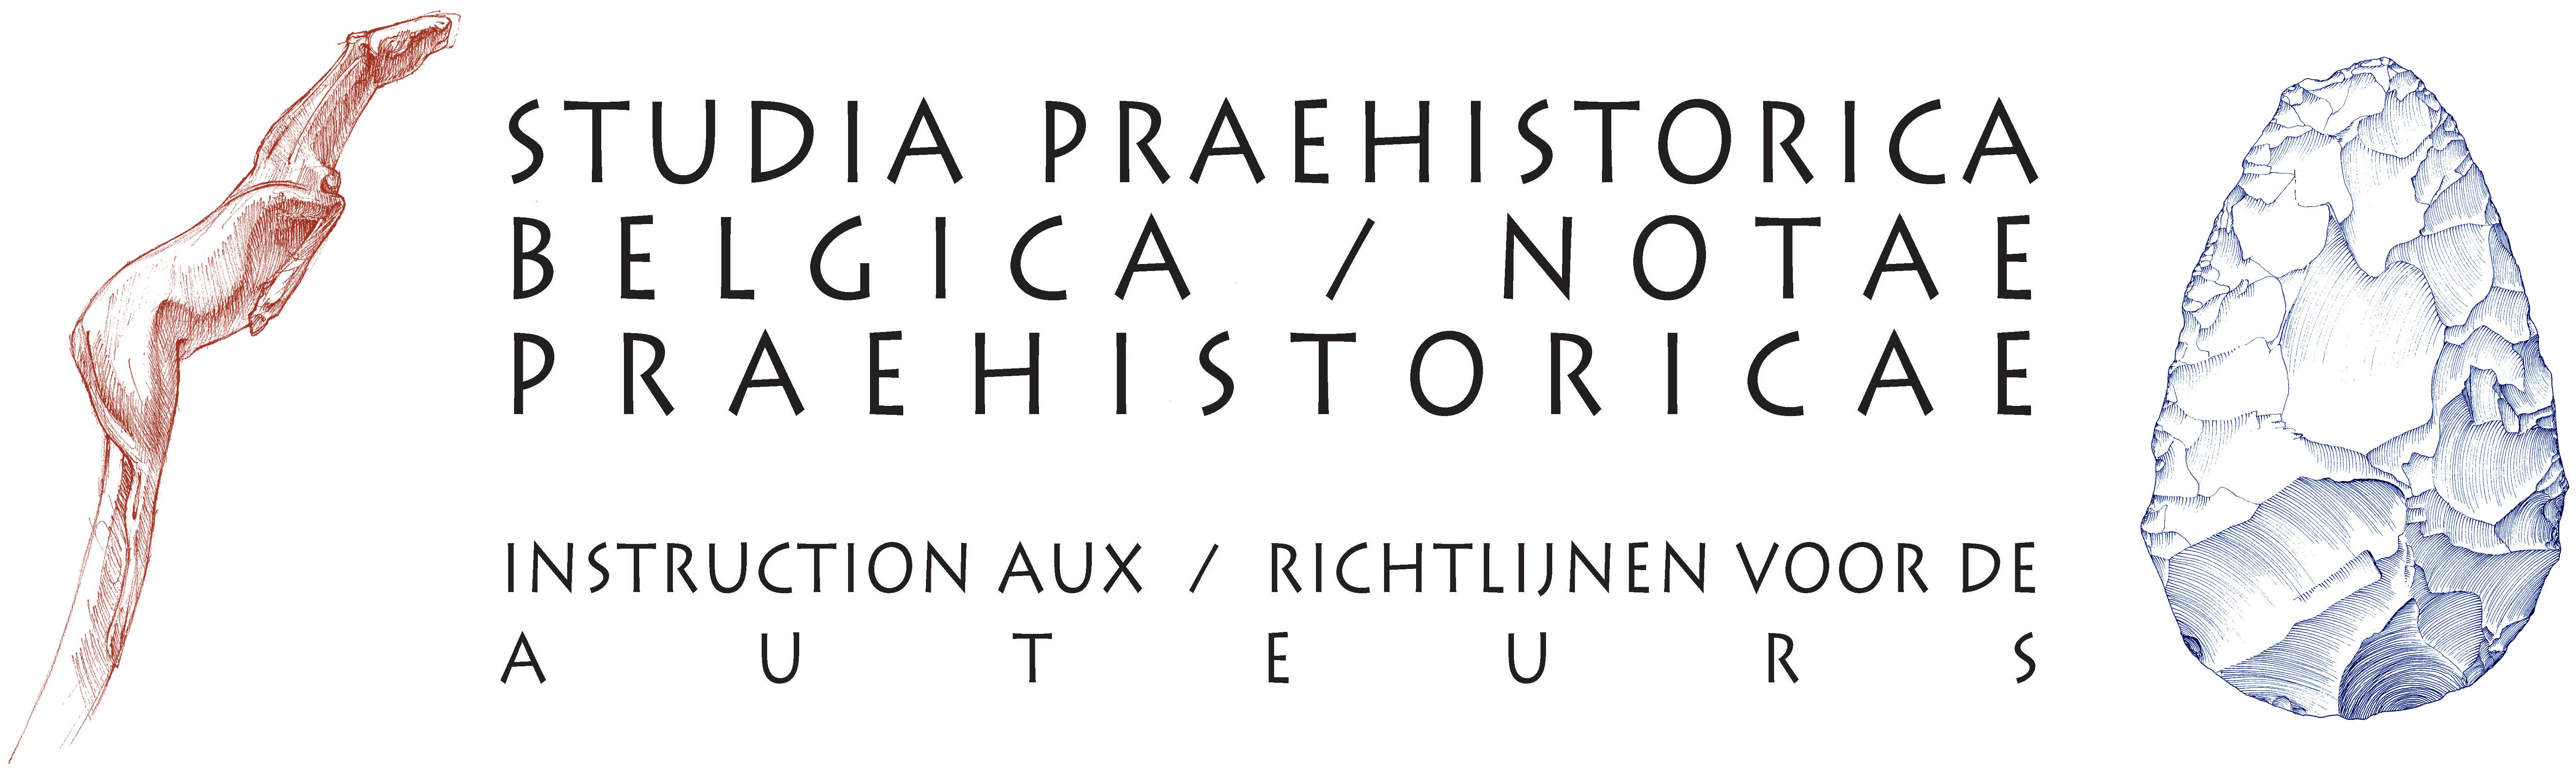 Logo_SPB-NP+Richtlijnen_FrNl_RVB-285x83-600_200813_b.jpg